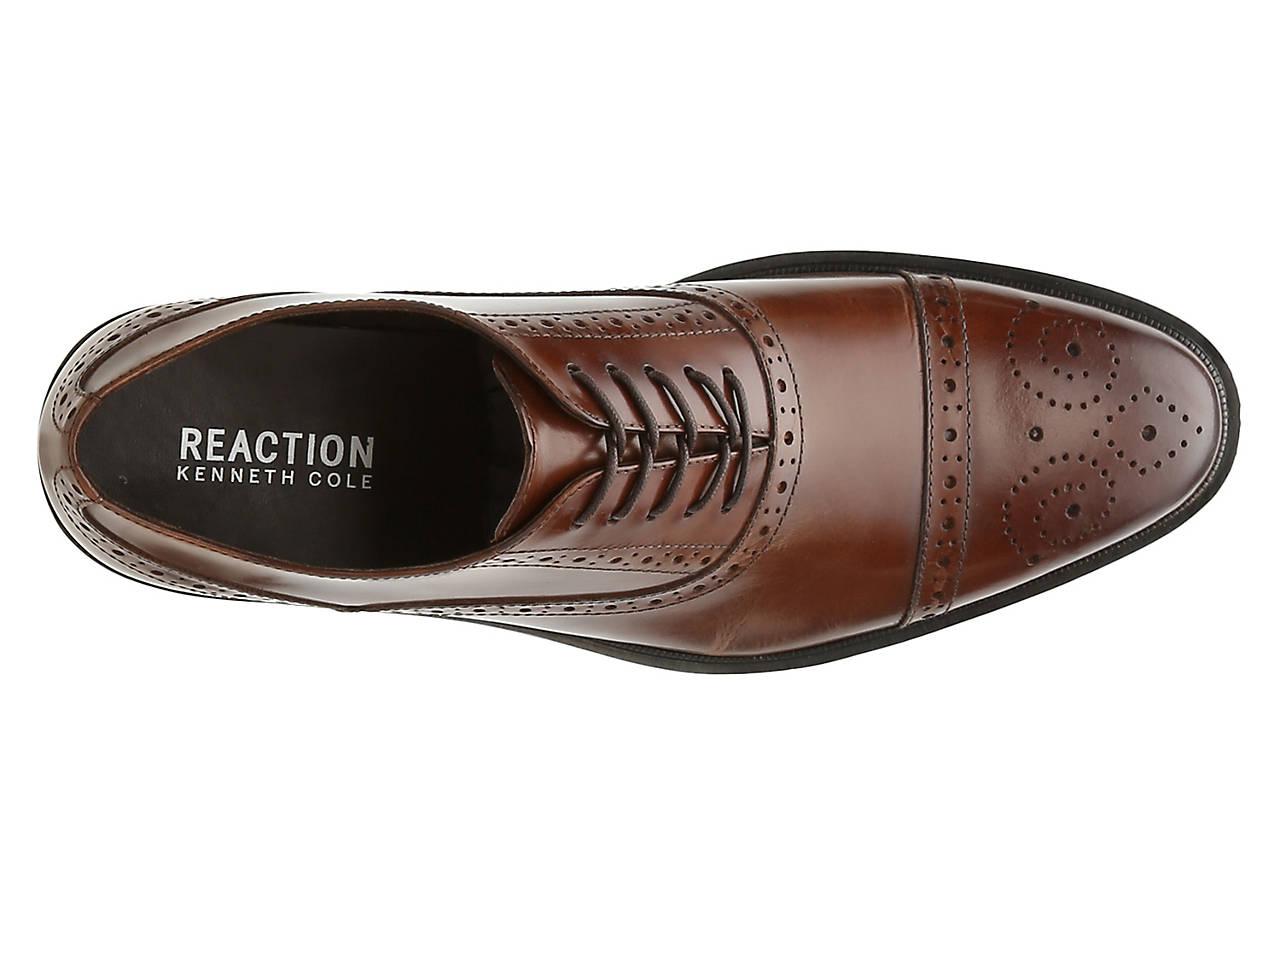 e63e0015dc7e Kenneth Cole Reaction Design Cap Toe Oxford Men s Shoes